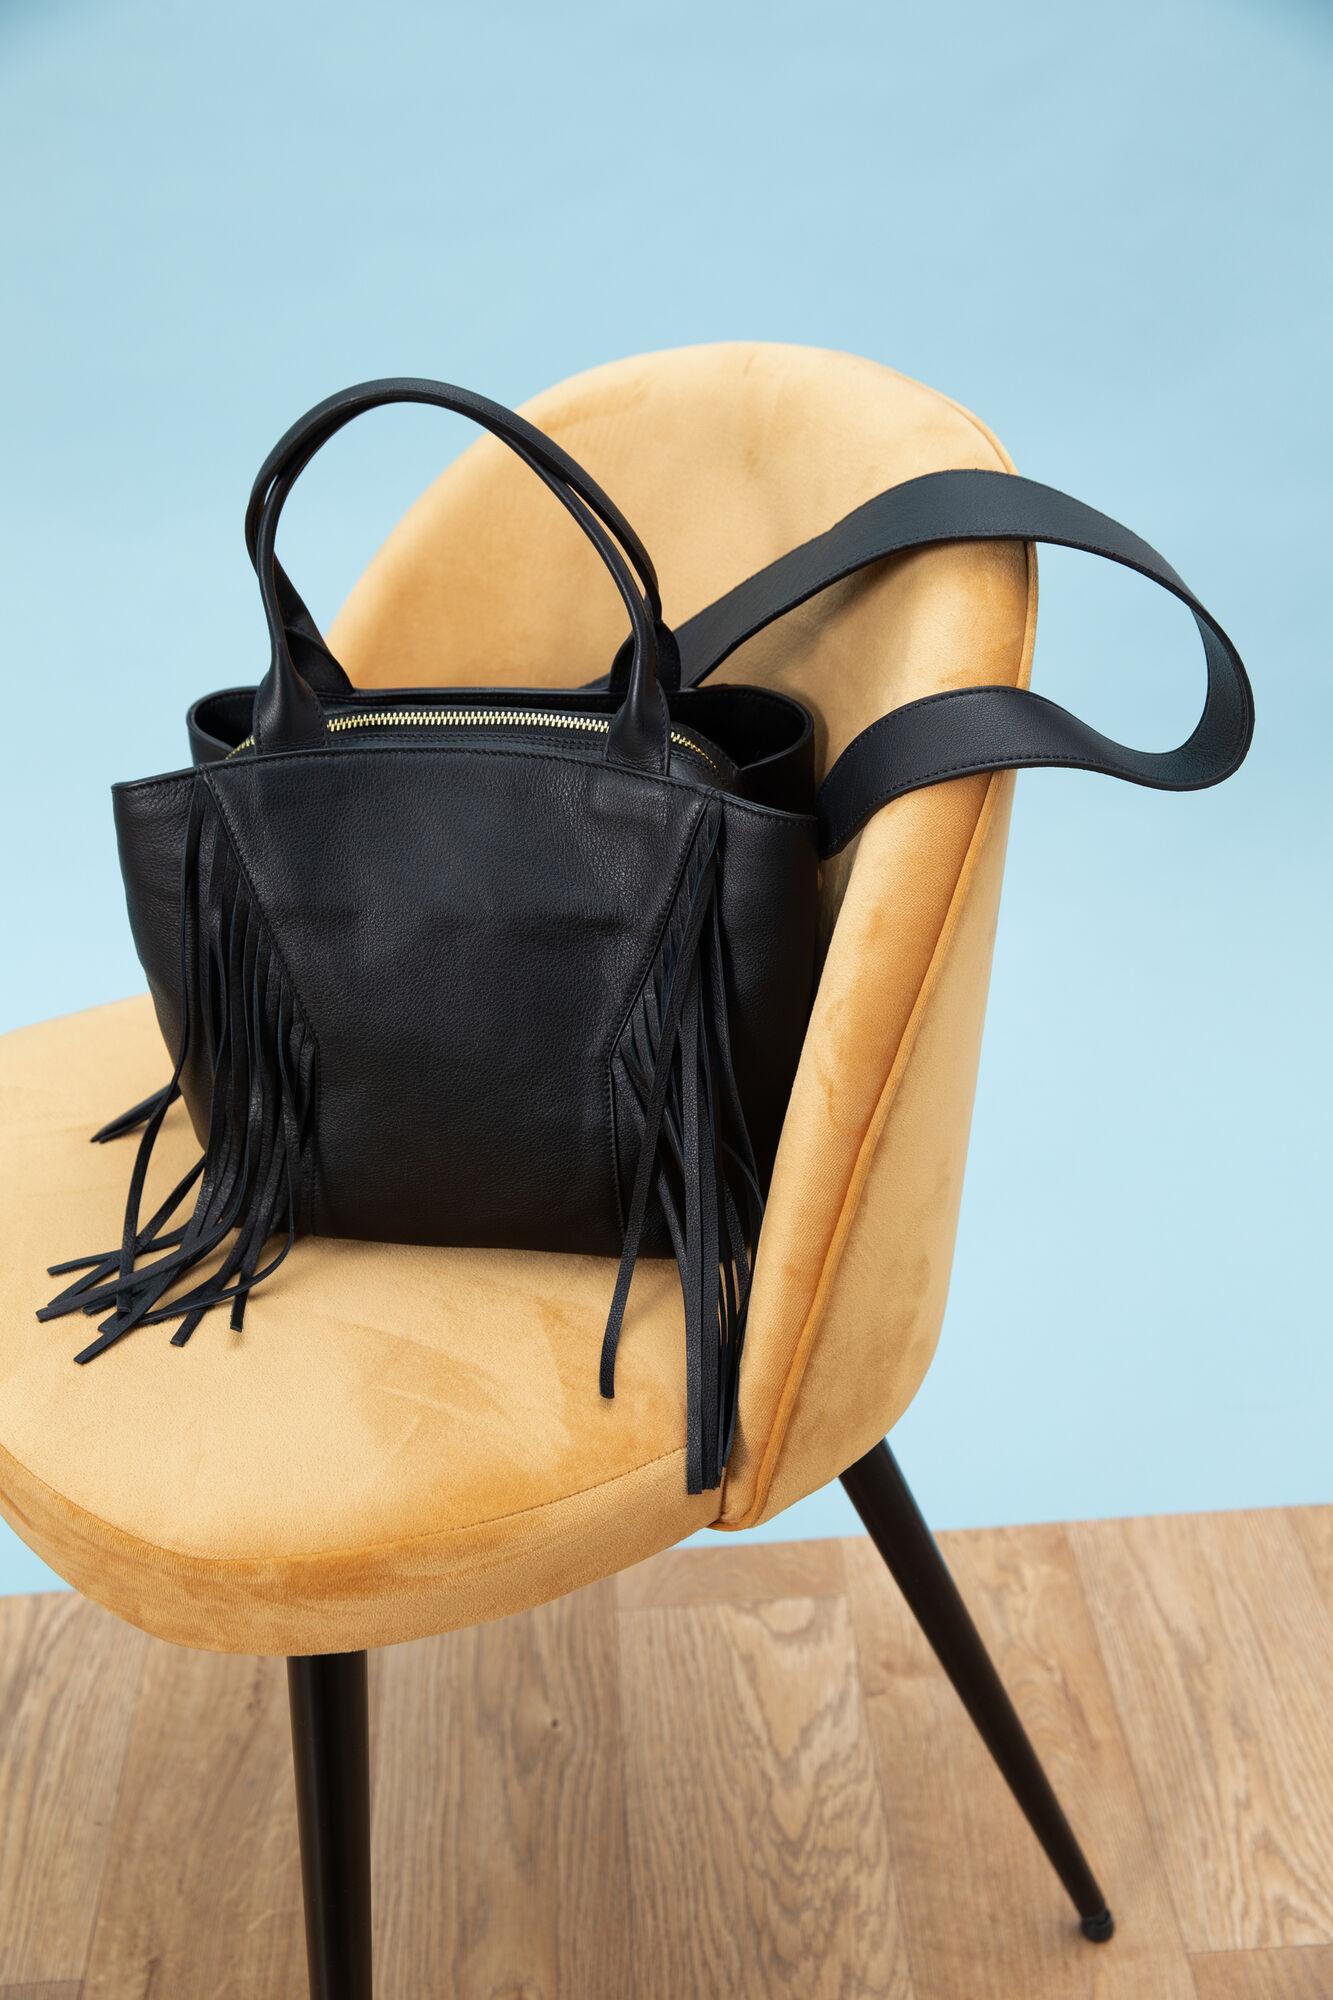 e5b270e69b9 Leren tas Carmen: Zwarte damestas voor € 185,00